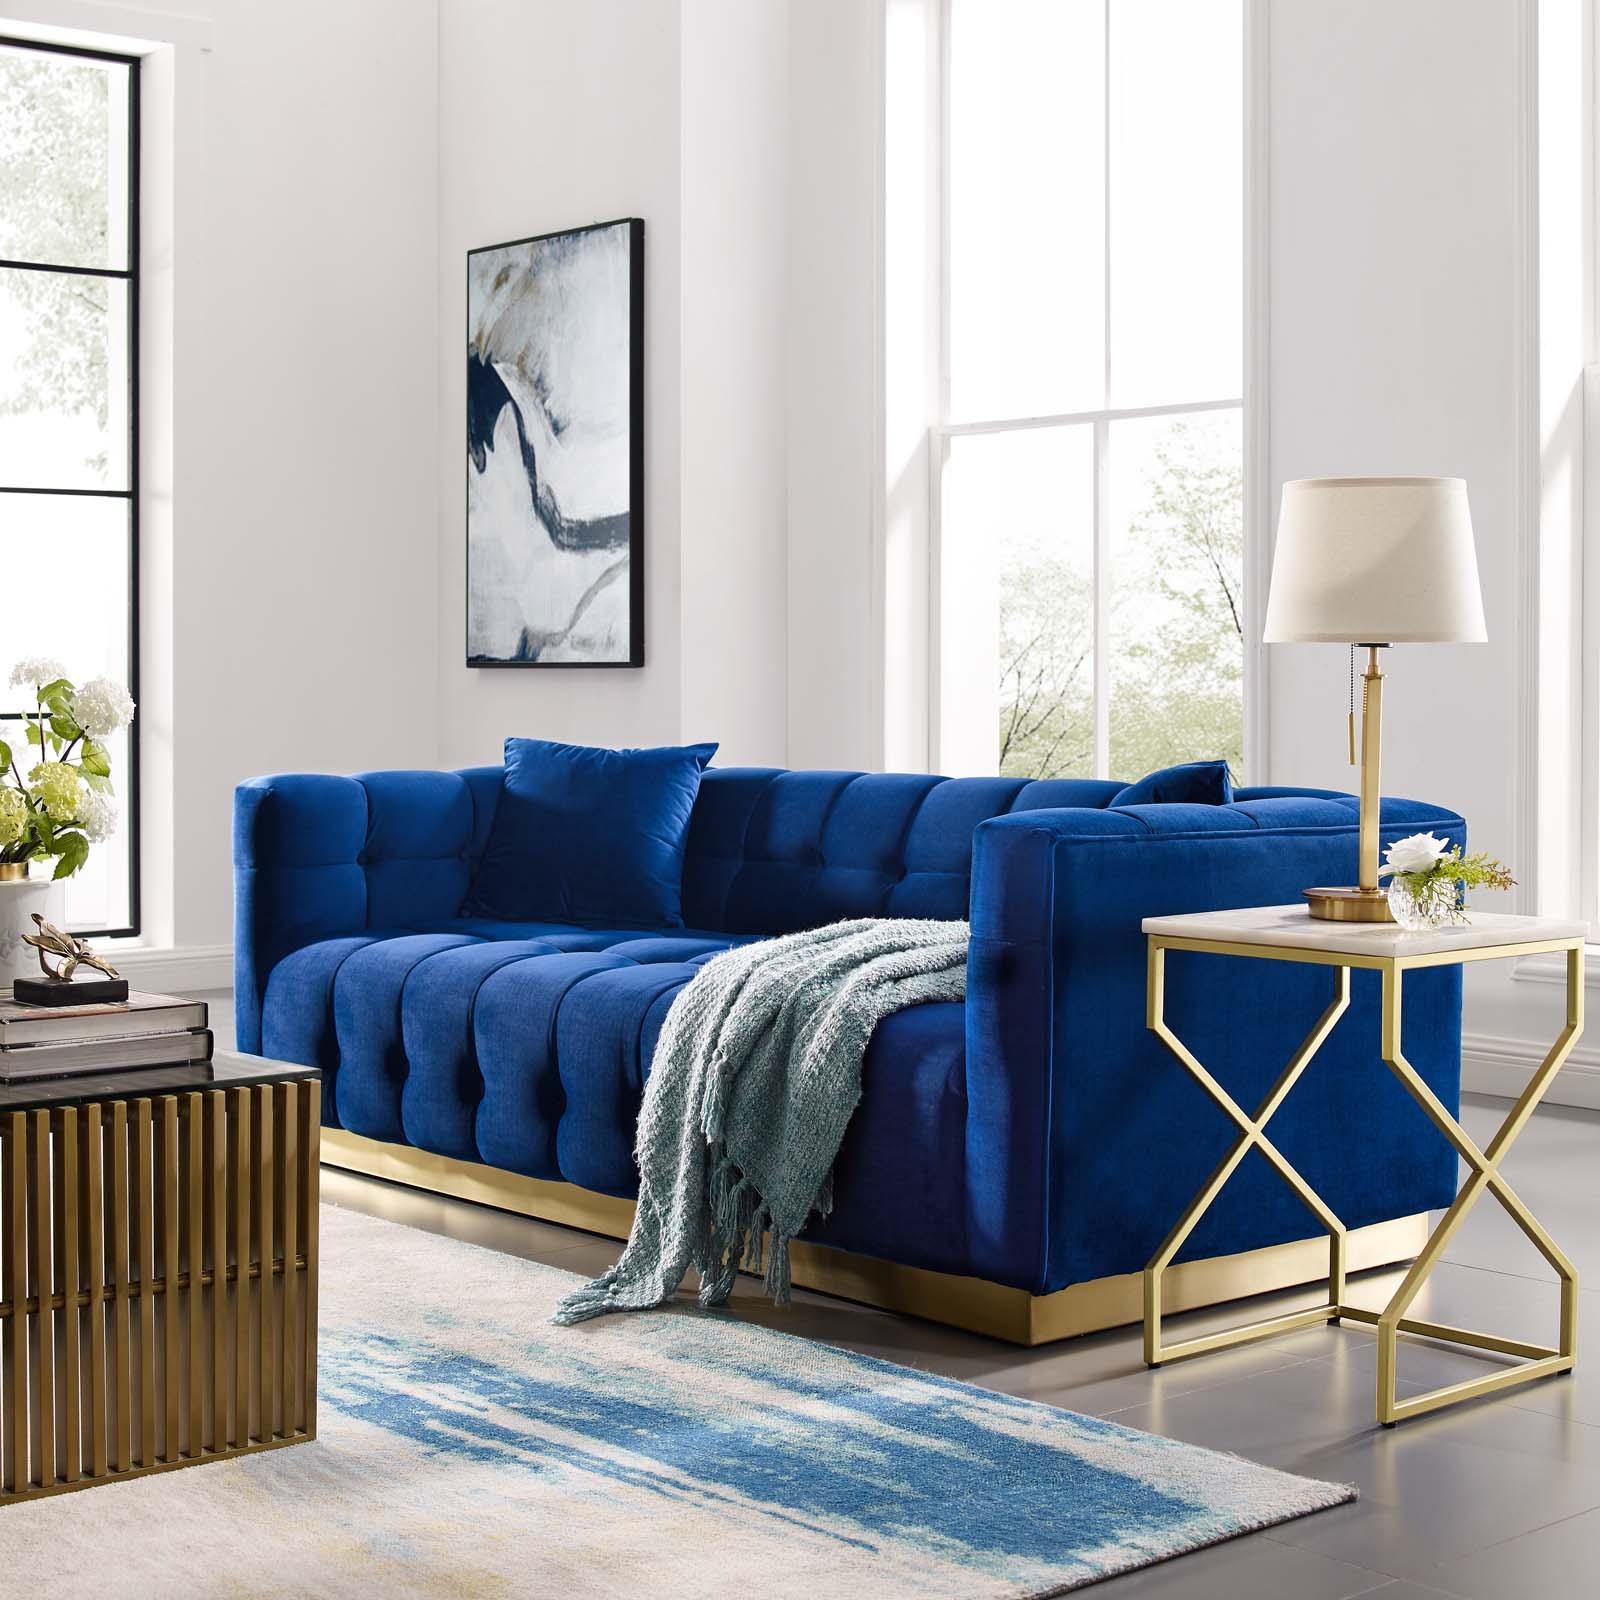 Vivacious Biscuit Tufted Navy Velvet Sofa Las Vegas Furniture Store Modern Home Furniture Cornerstone Furniture